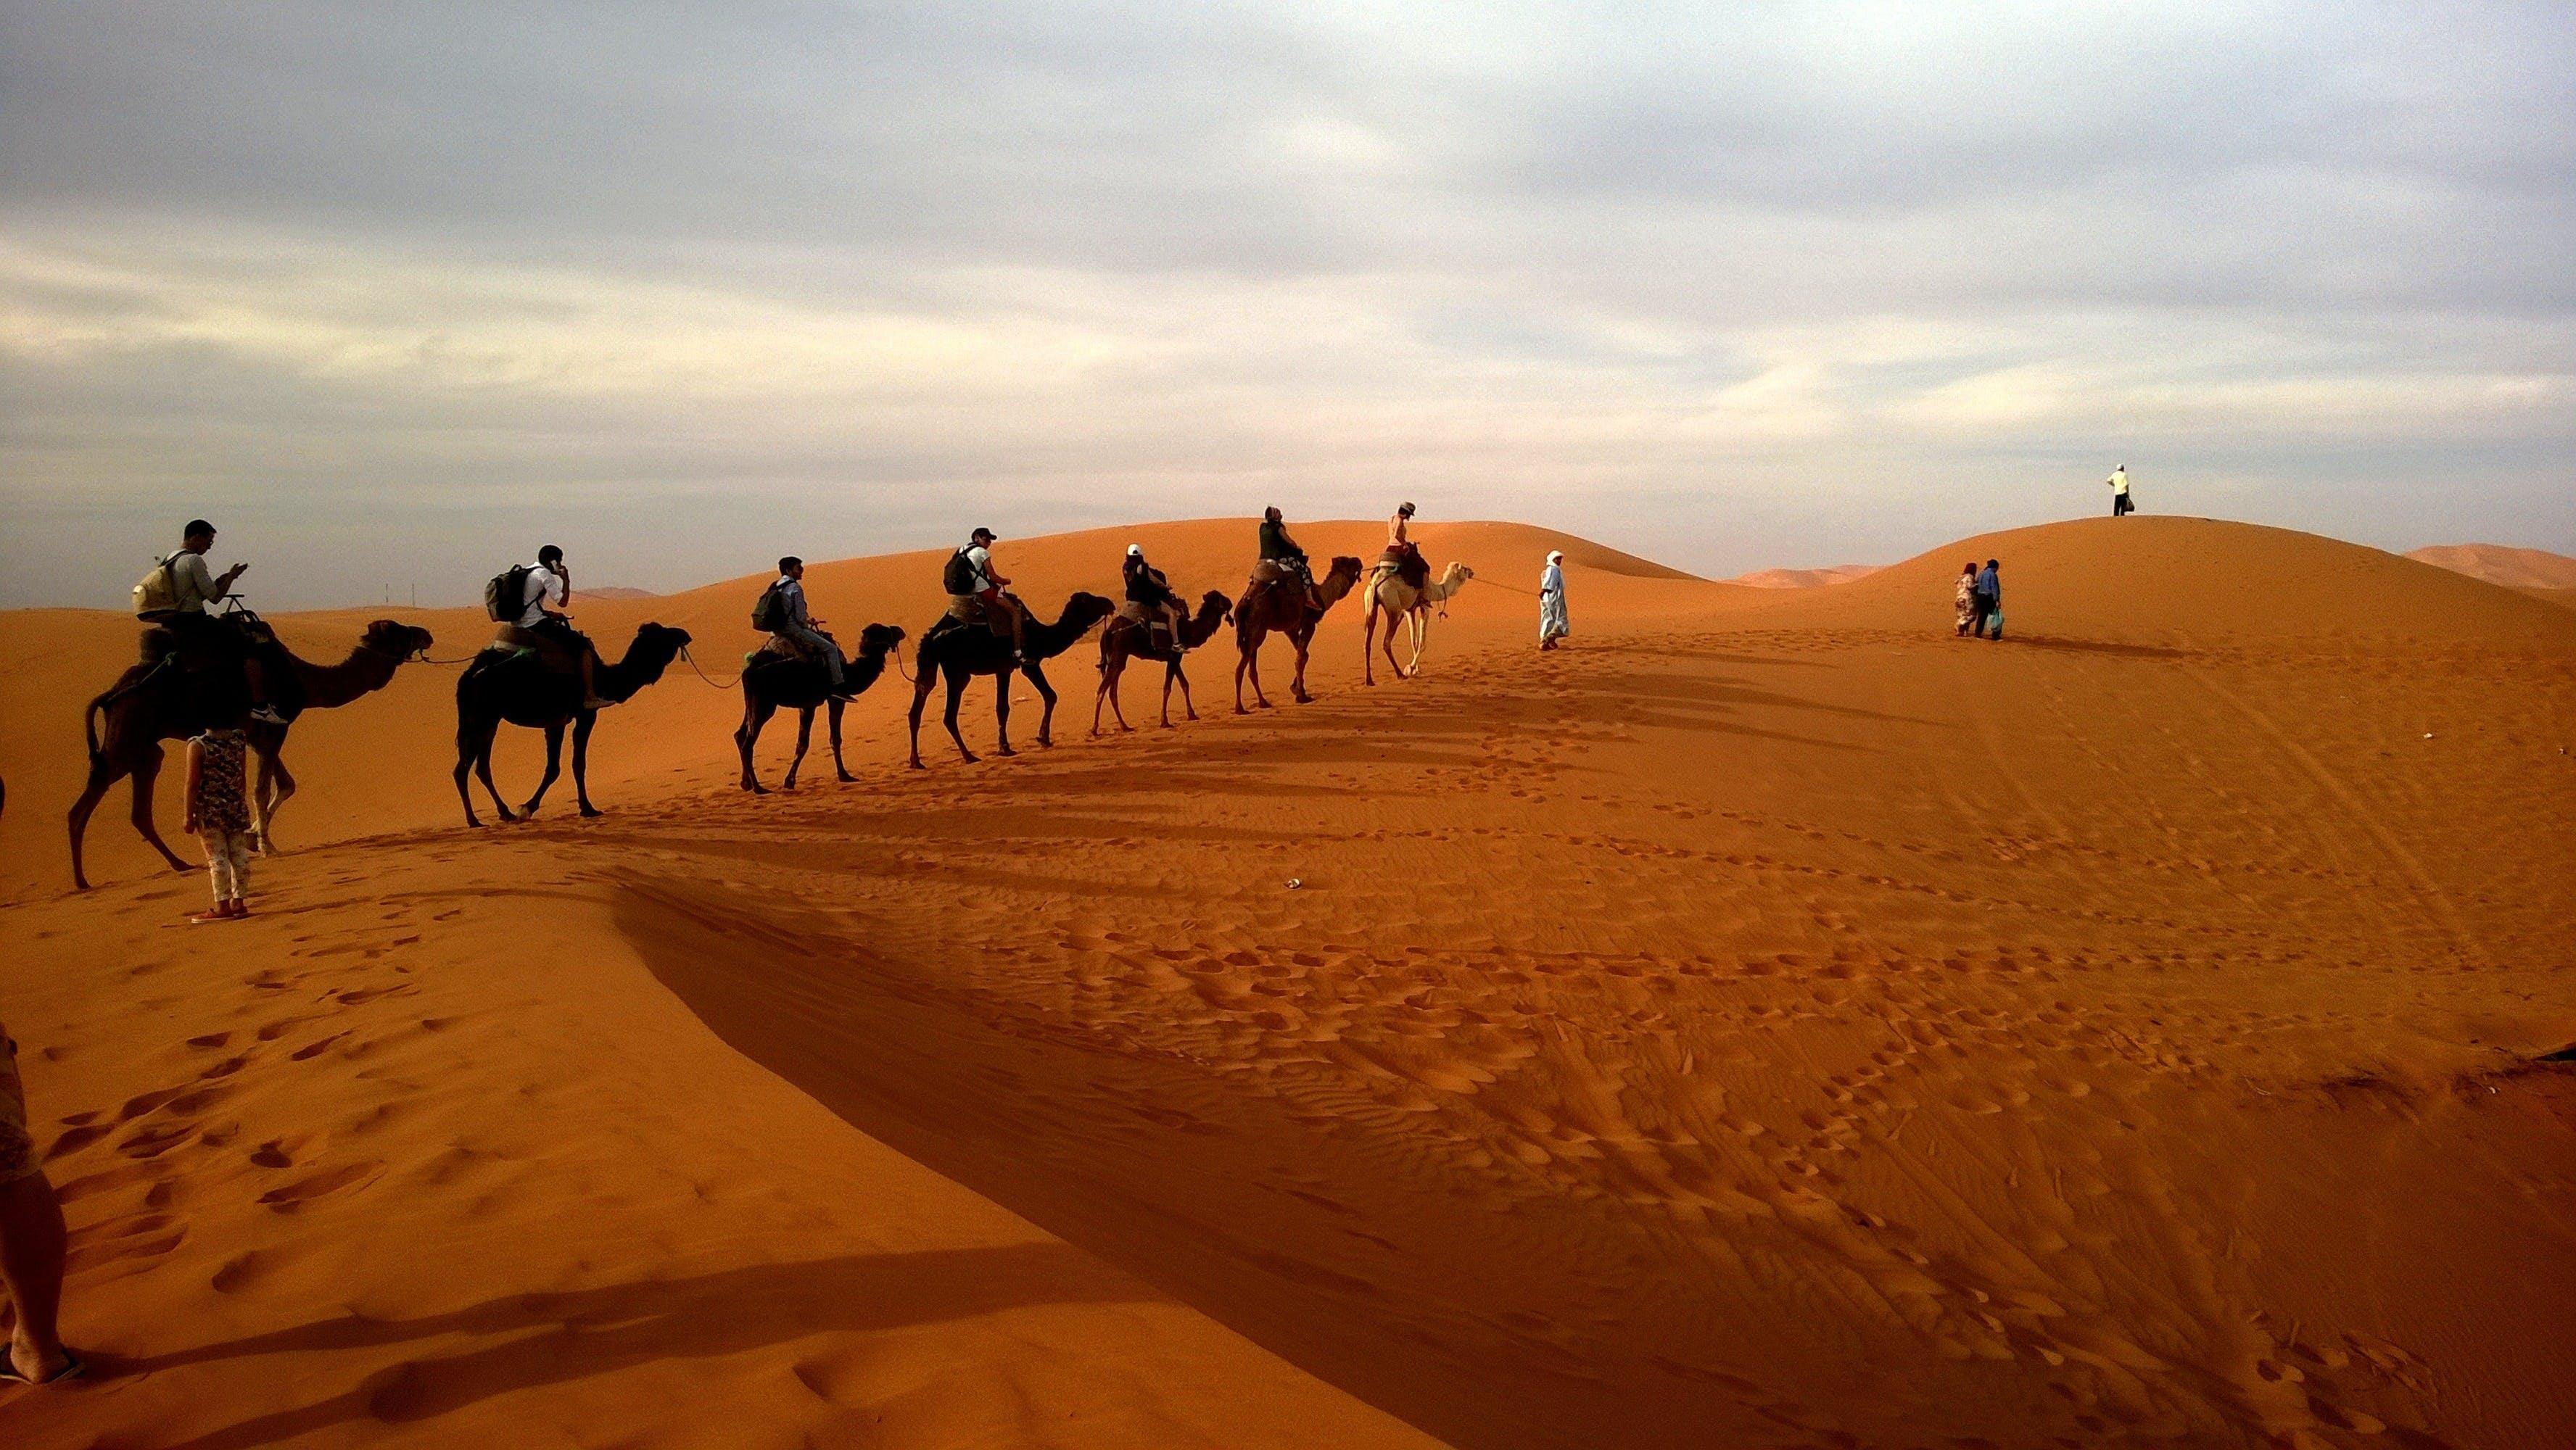 Kostenloses Stock Foto zu himmel, kamele, landschaft, menschen